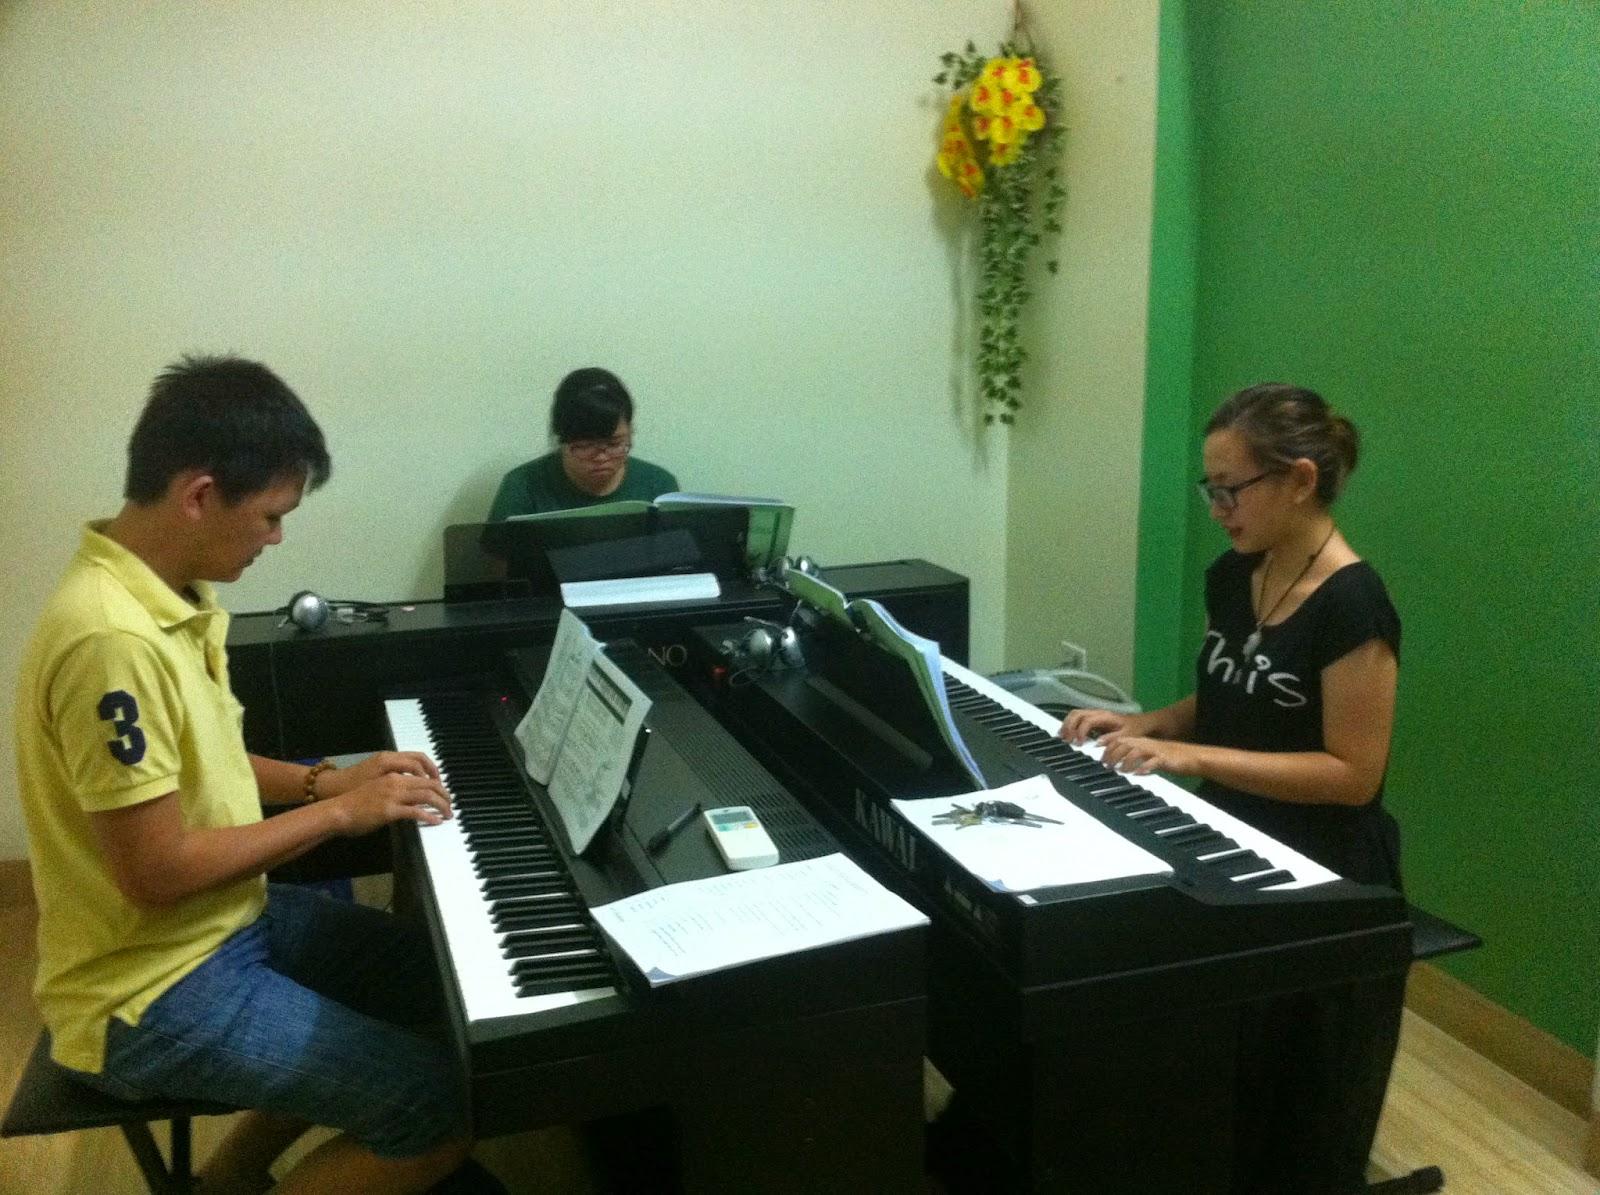 lớp học piano nhóm